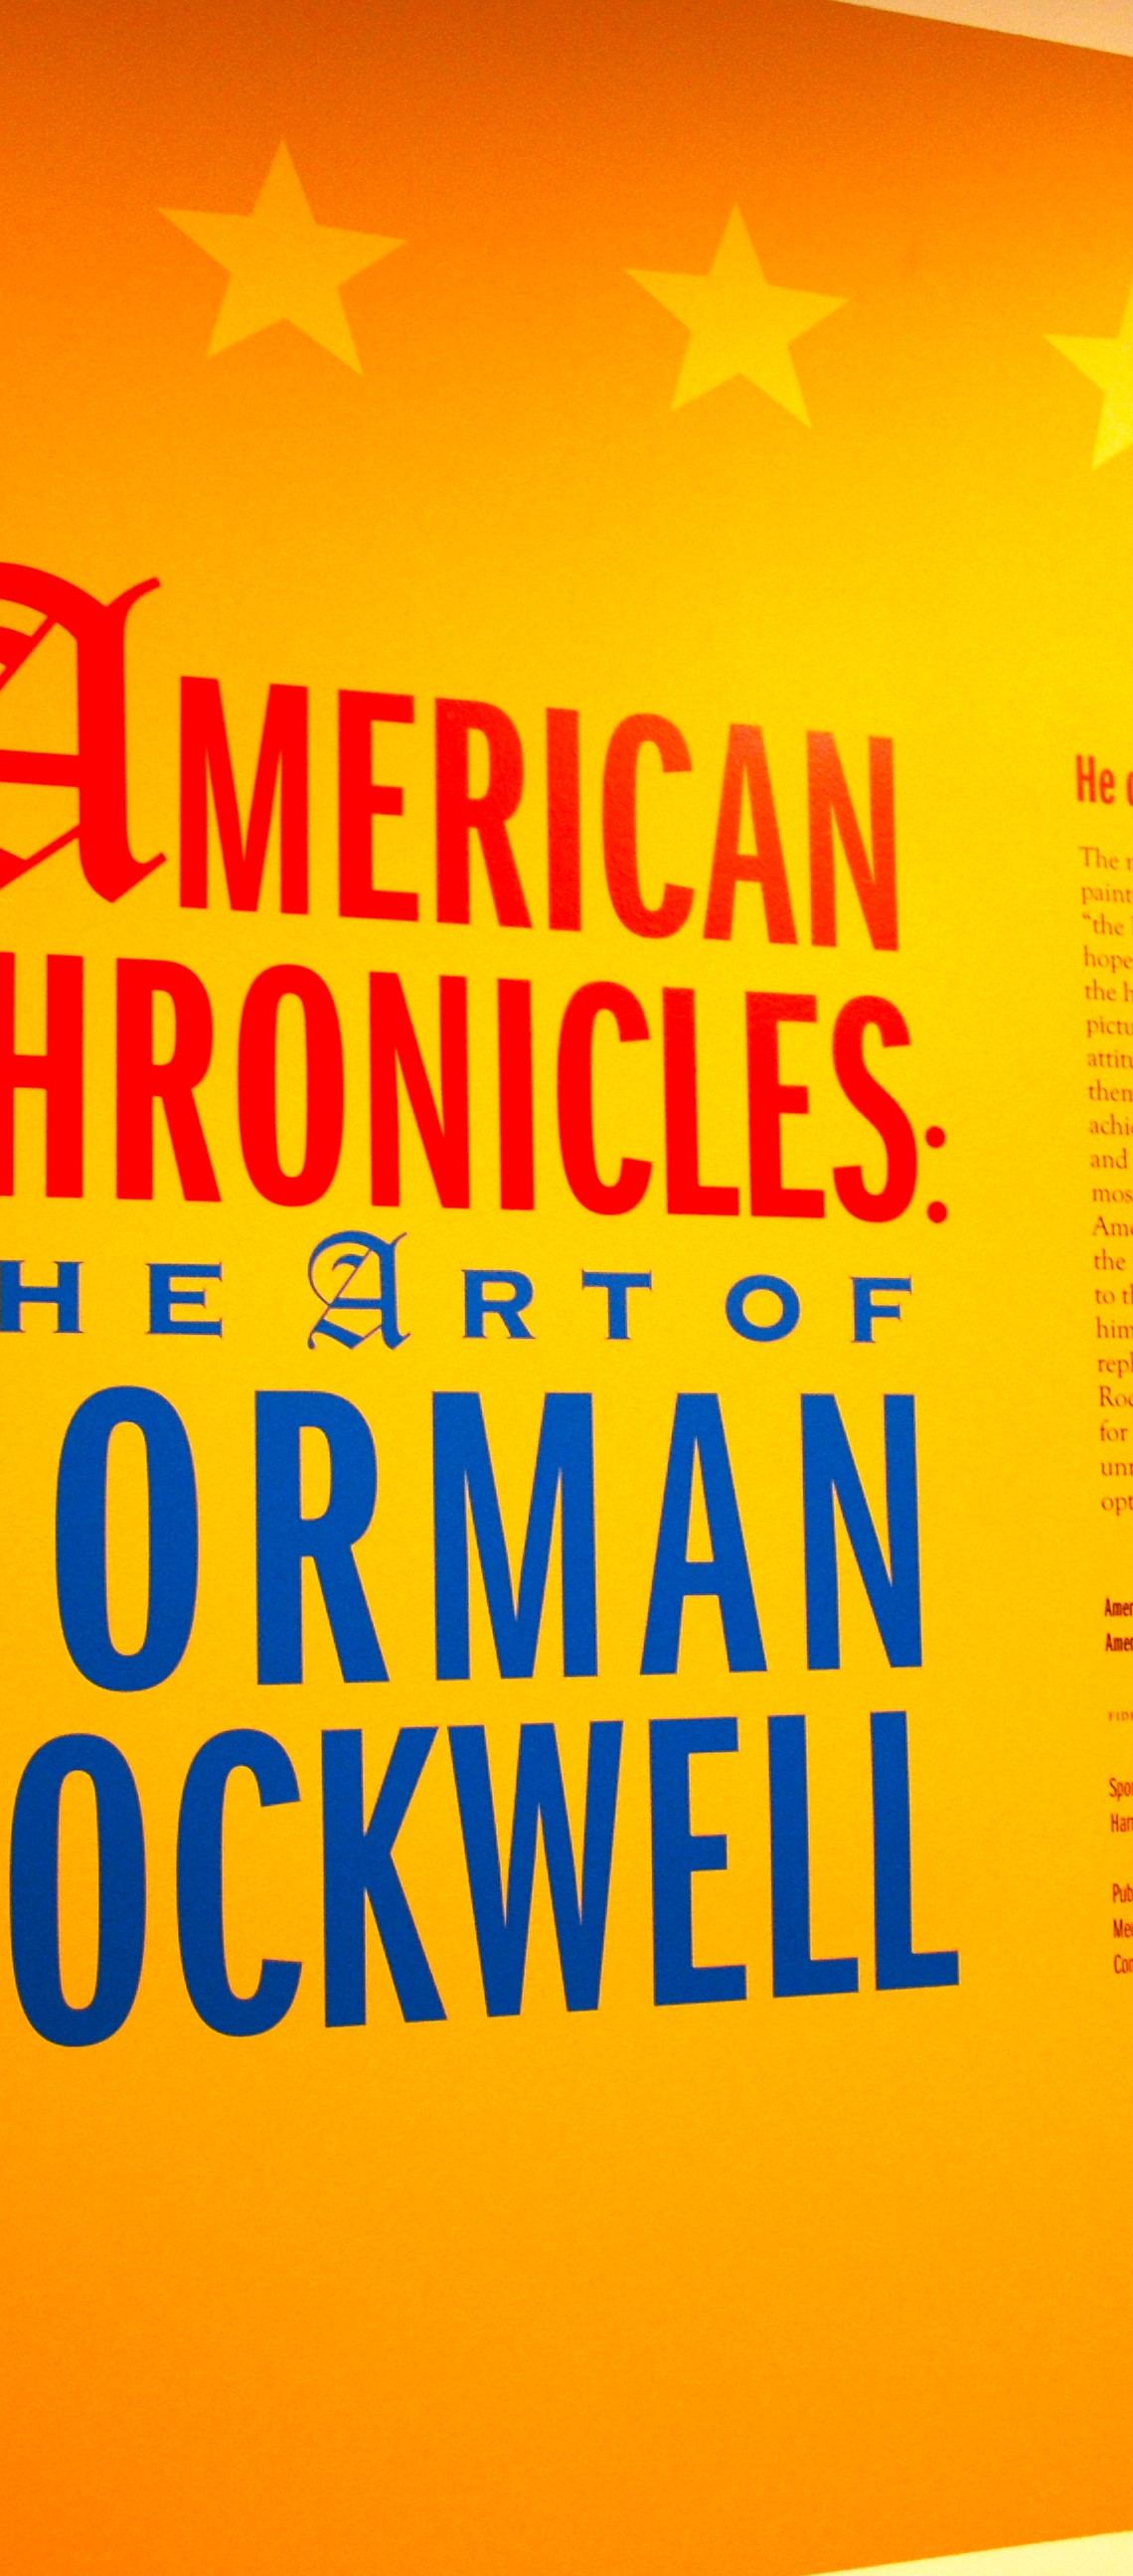 Crystal Bridges Hosts Norman Rockwell Exhibition